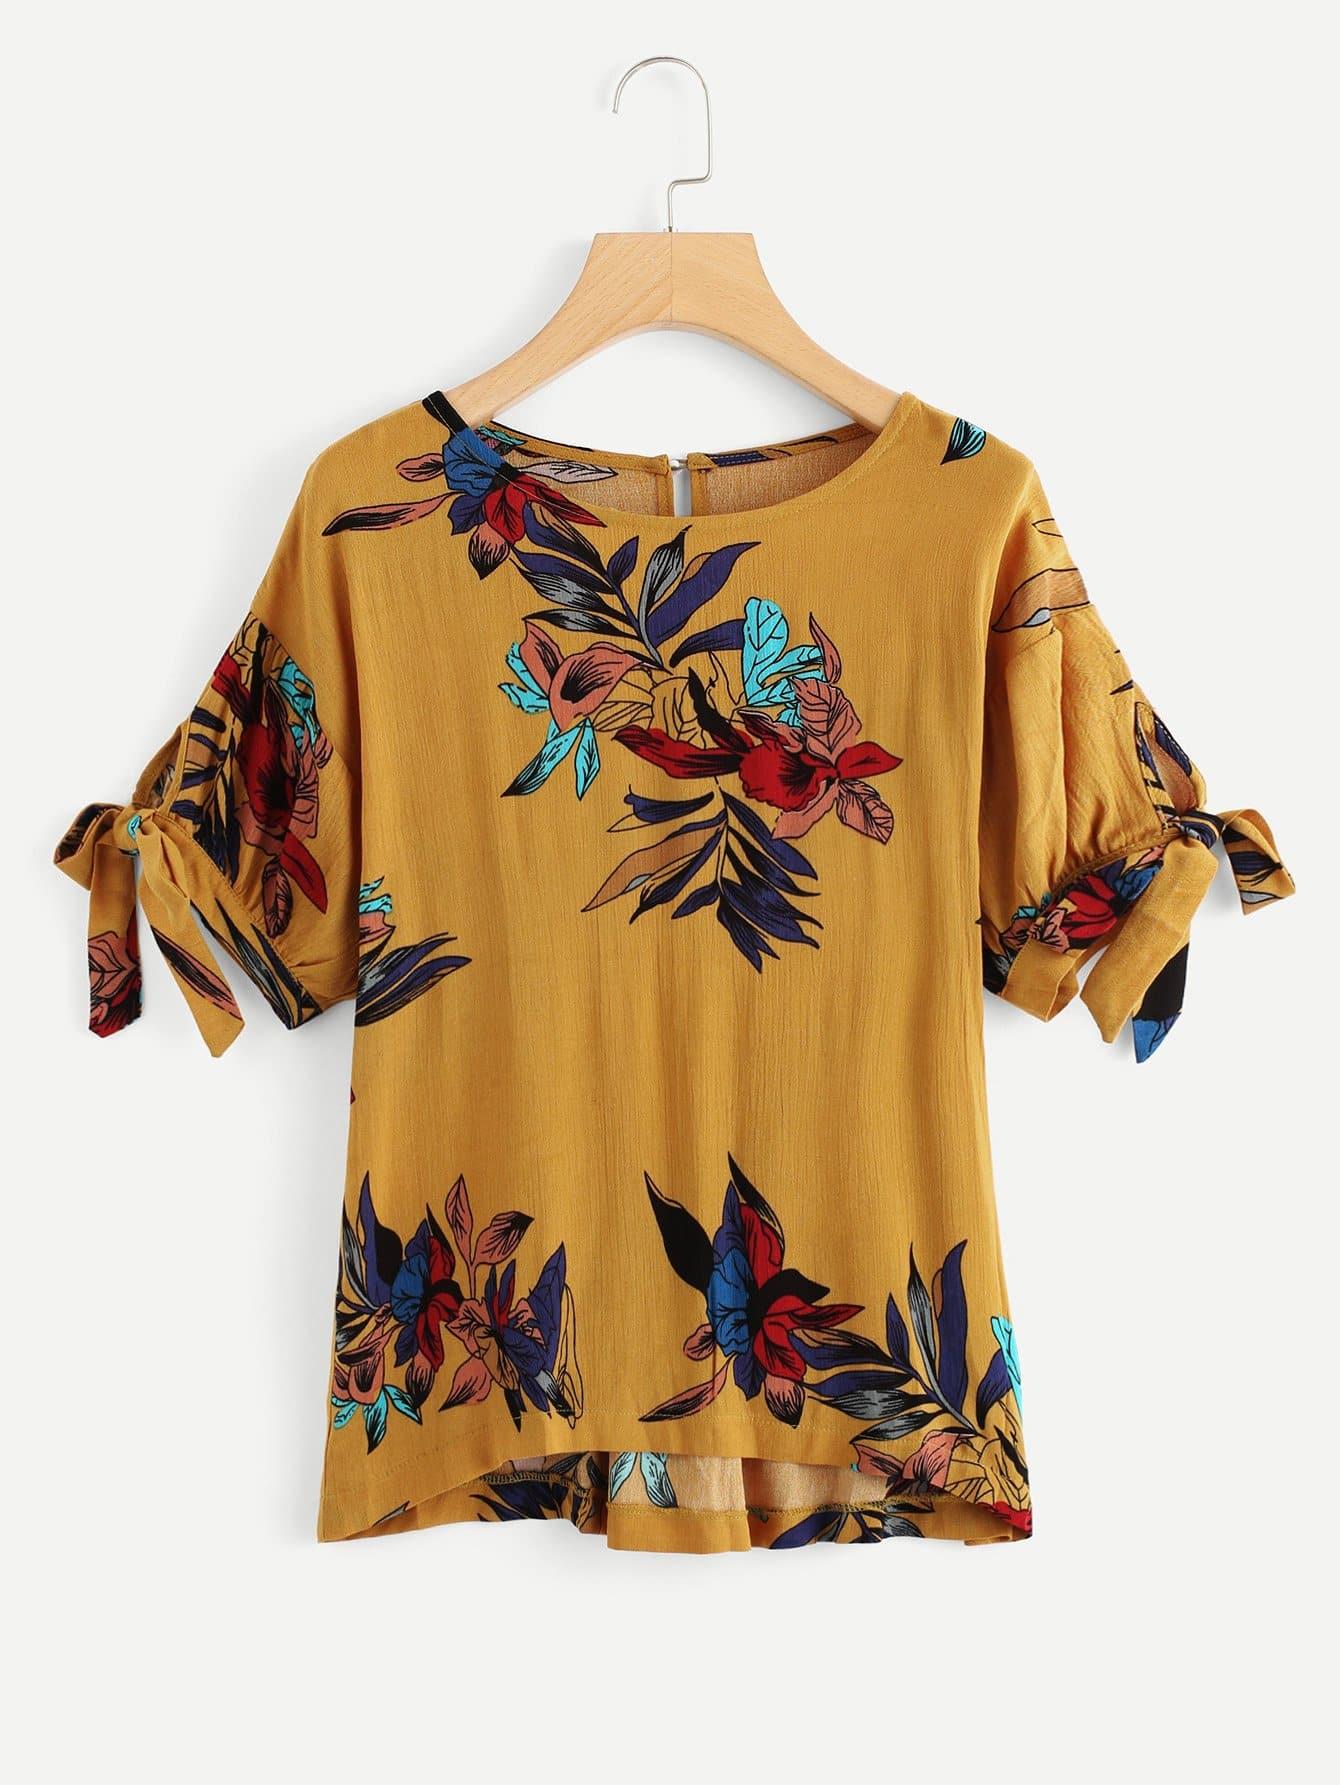 Flower Print Tie Cuff Blouse tie cuff button front blouse